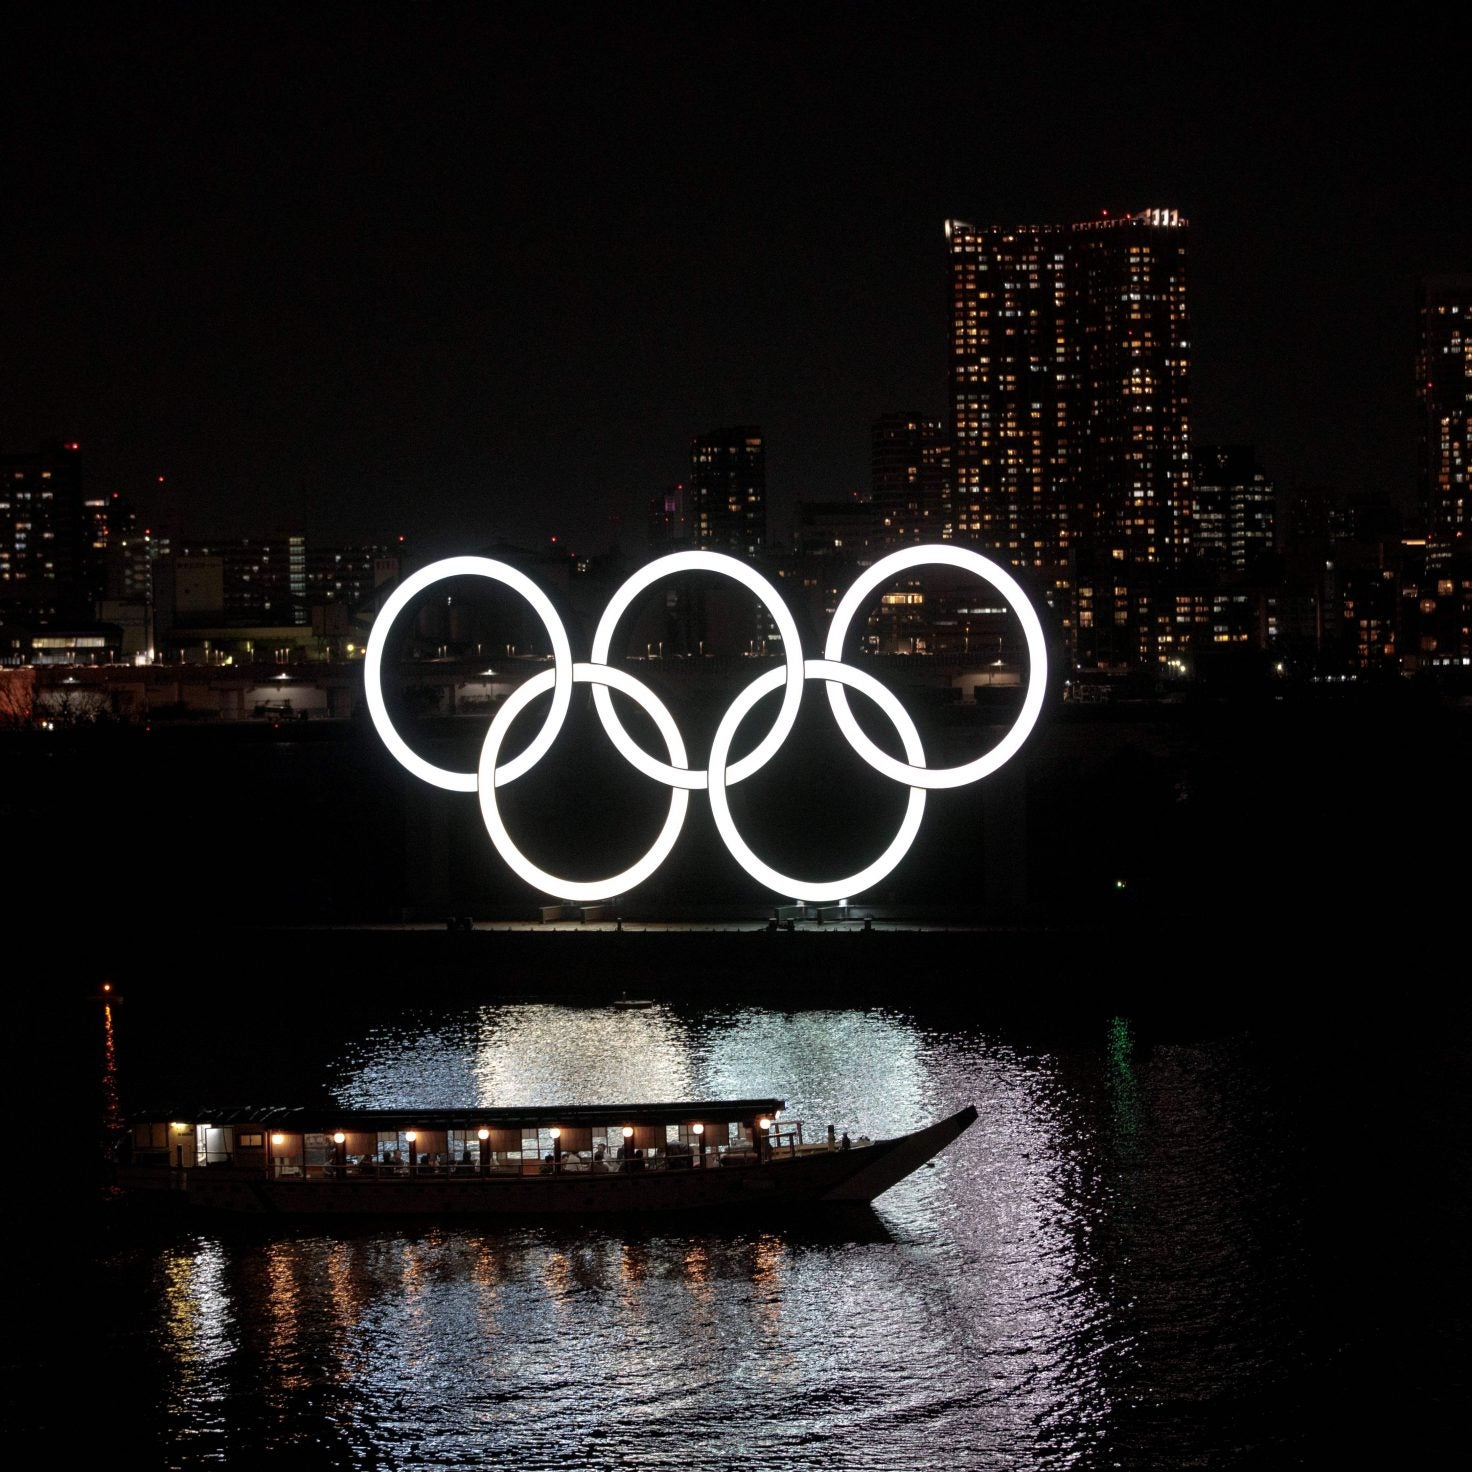 IOC Member Says Olympics To Be Postponed Until 2021